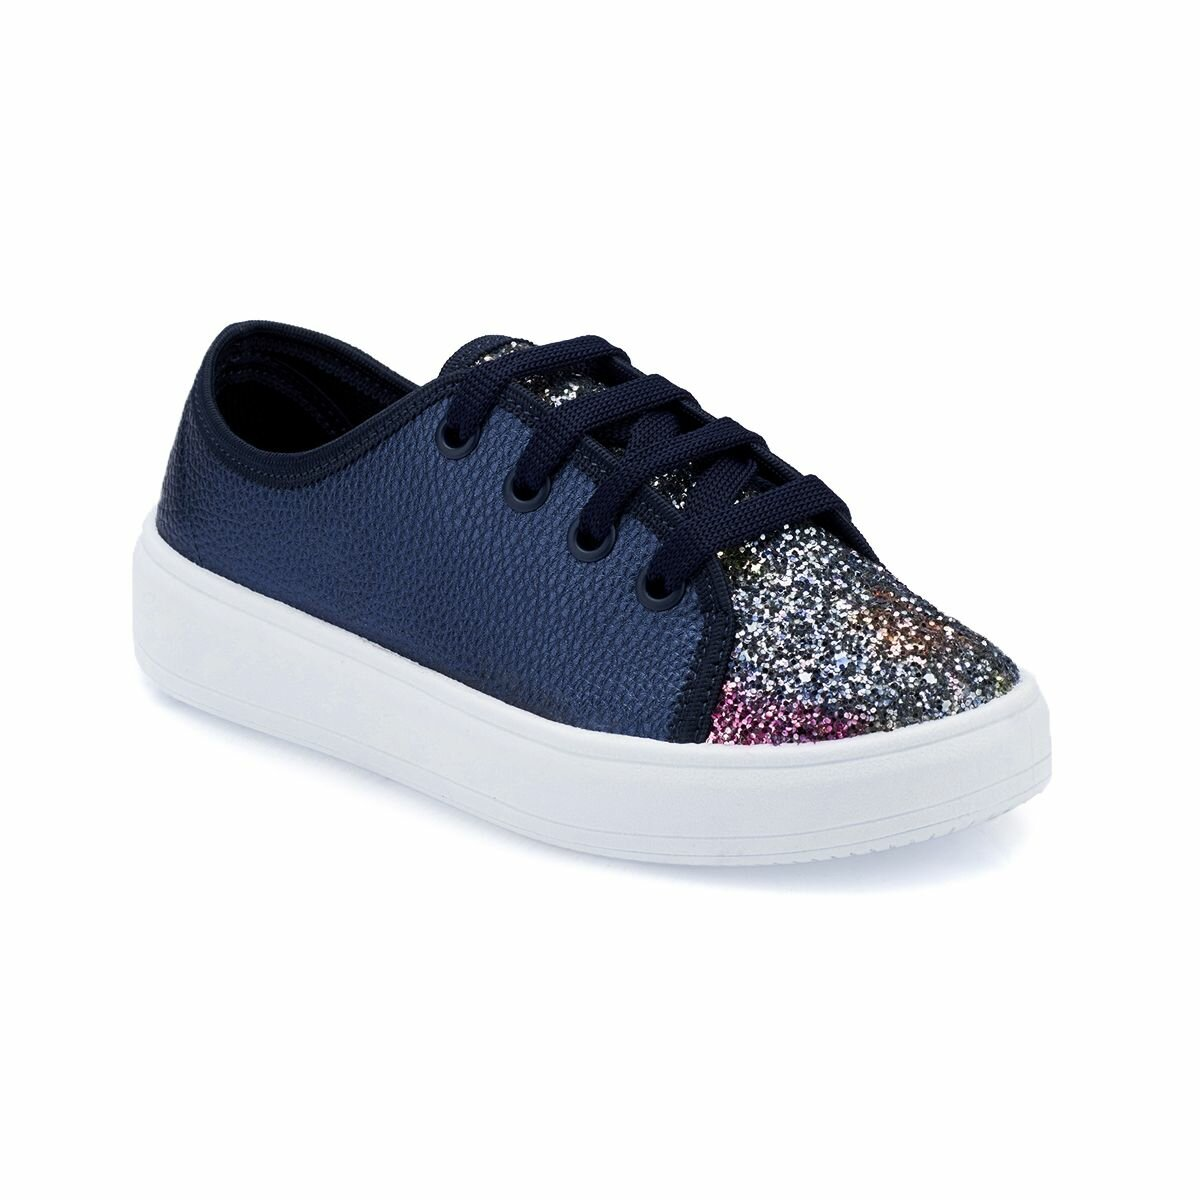 FLO 82.510664.F Navy Blue Female Child Sneaker Shoes Polaris